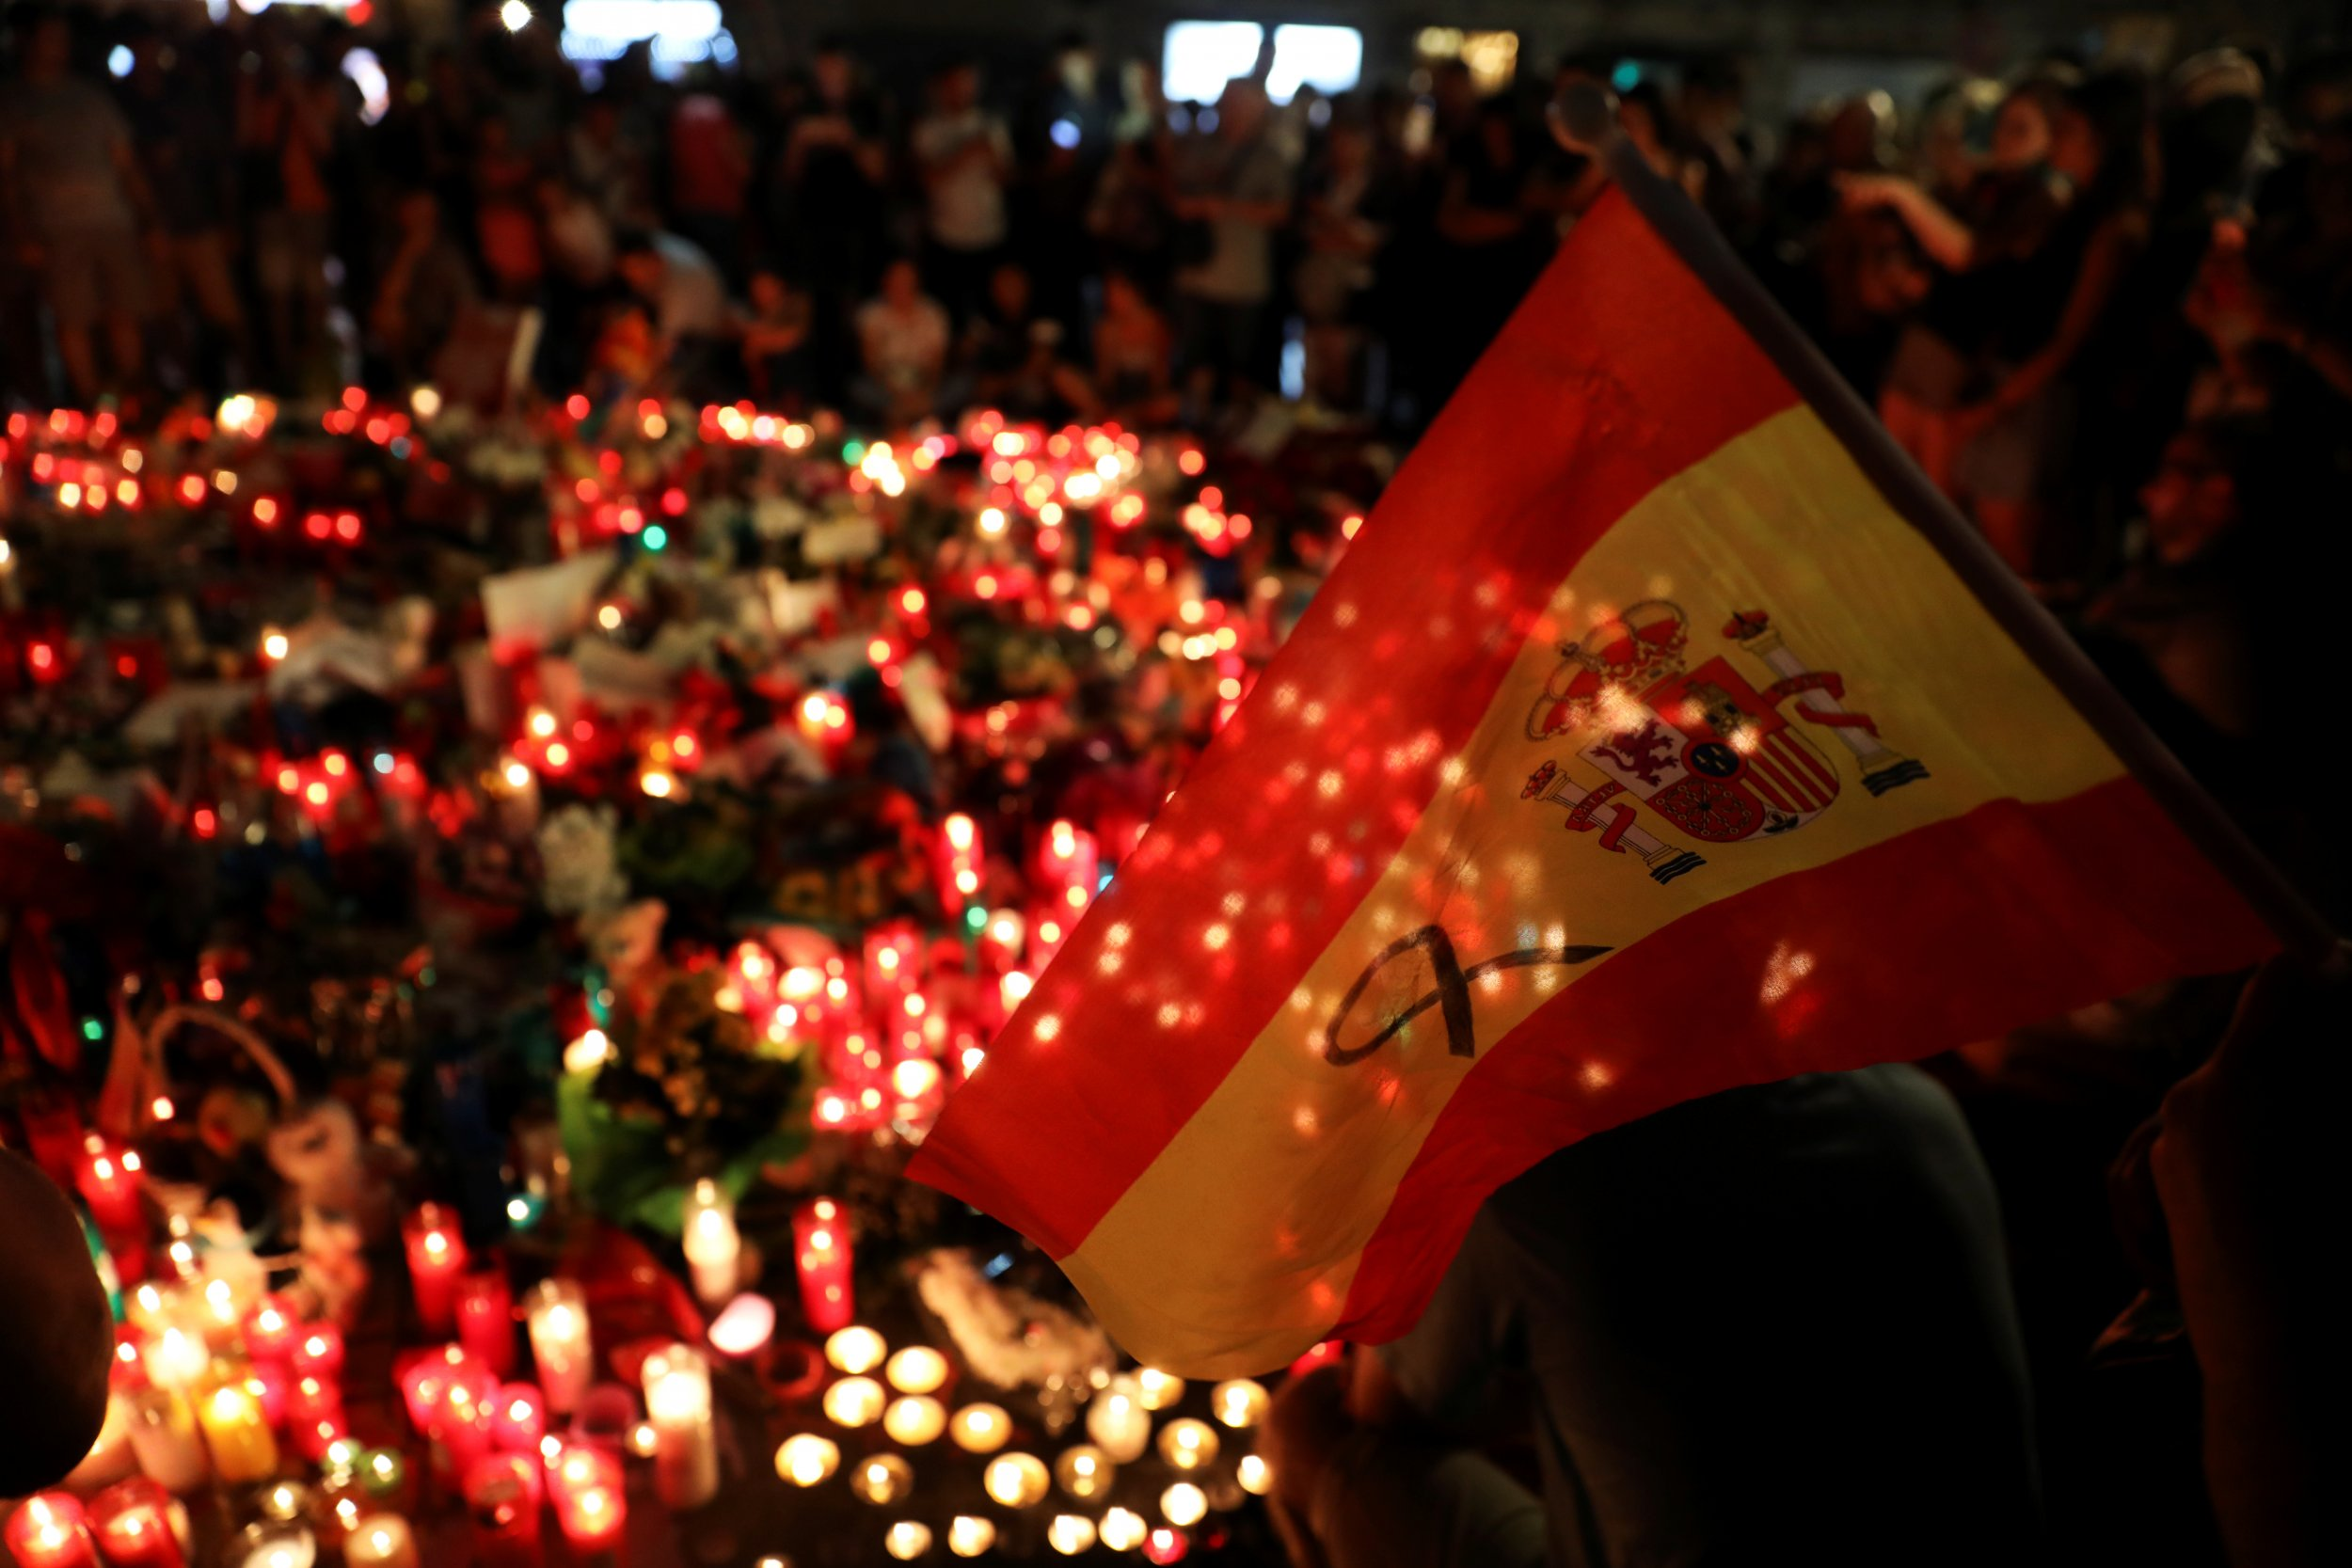 Barcelona Attack Memorial